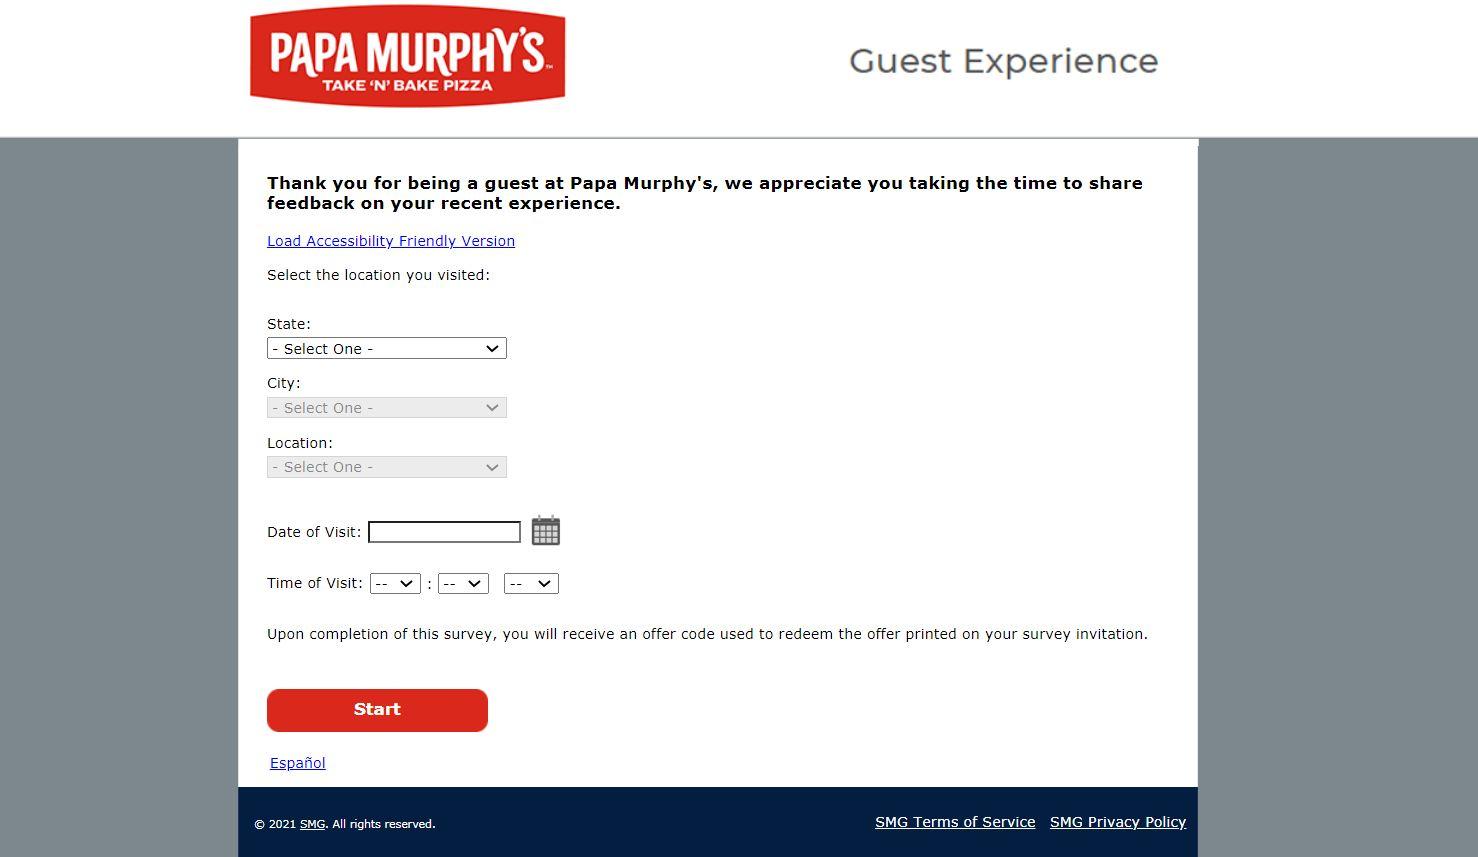 Papasurvey - Get $20 Gift Card - Papa Murphy's Survey